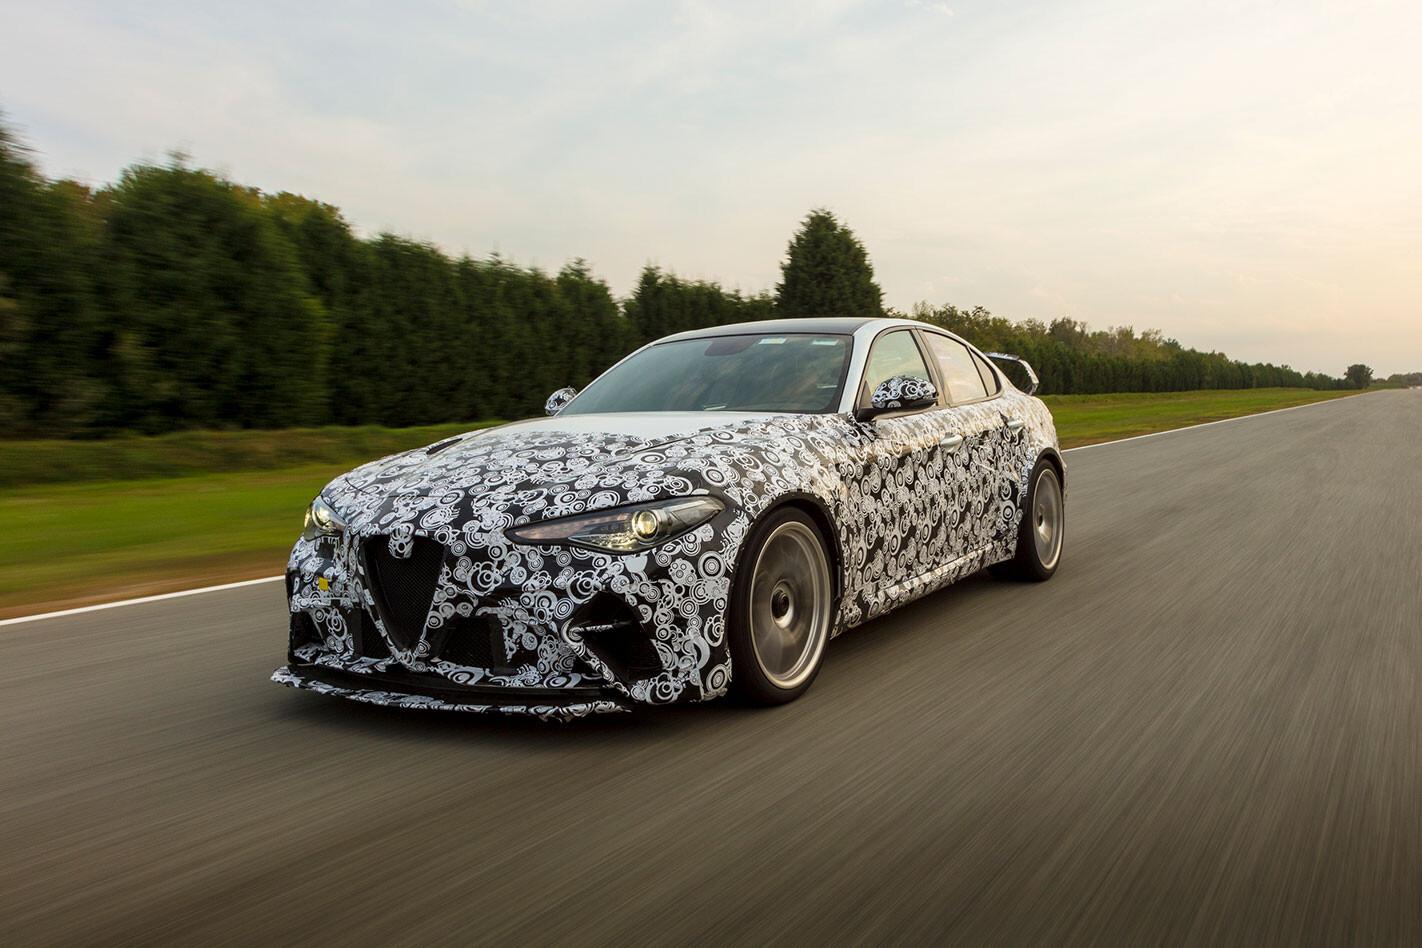 F1 drivers test Alfa Romeo Giulia GTA